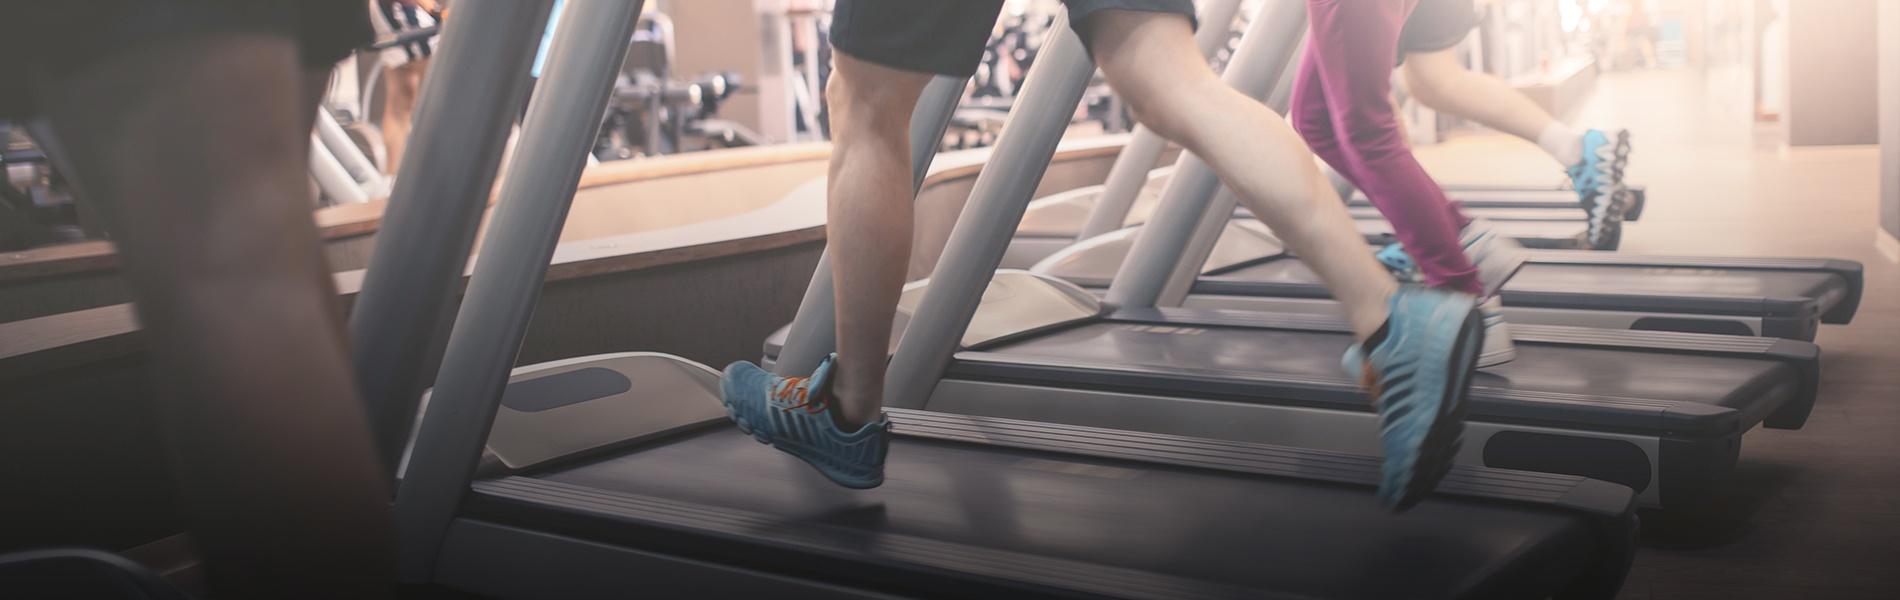 Free-Gym-Trial-Memberships-vs-Discounting-1900x600.jpg